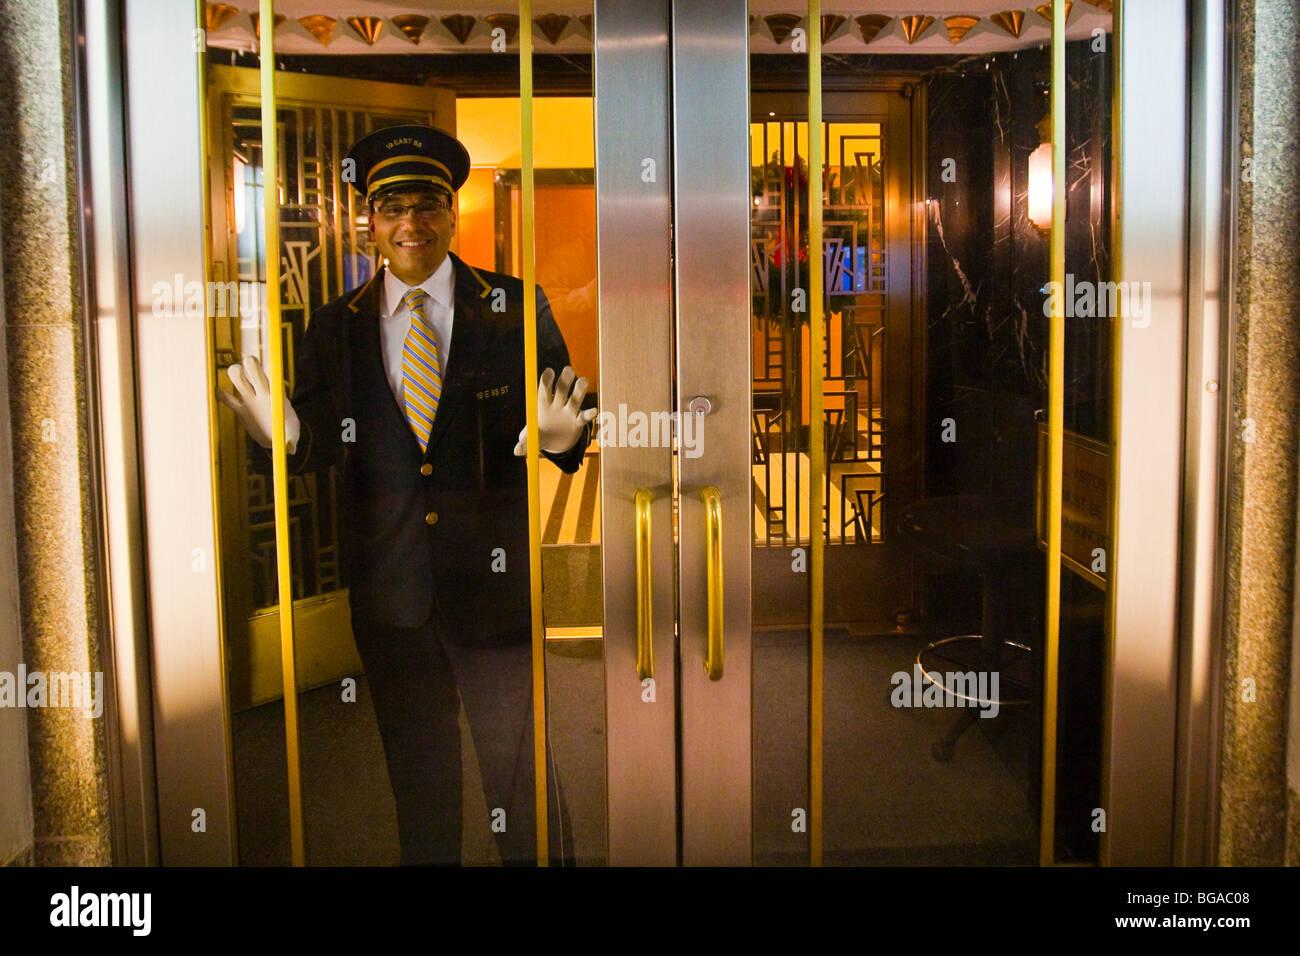 City Apartment Building Entrance apartment doorman jobs & apartments in orlando fl